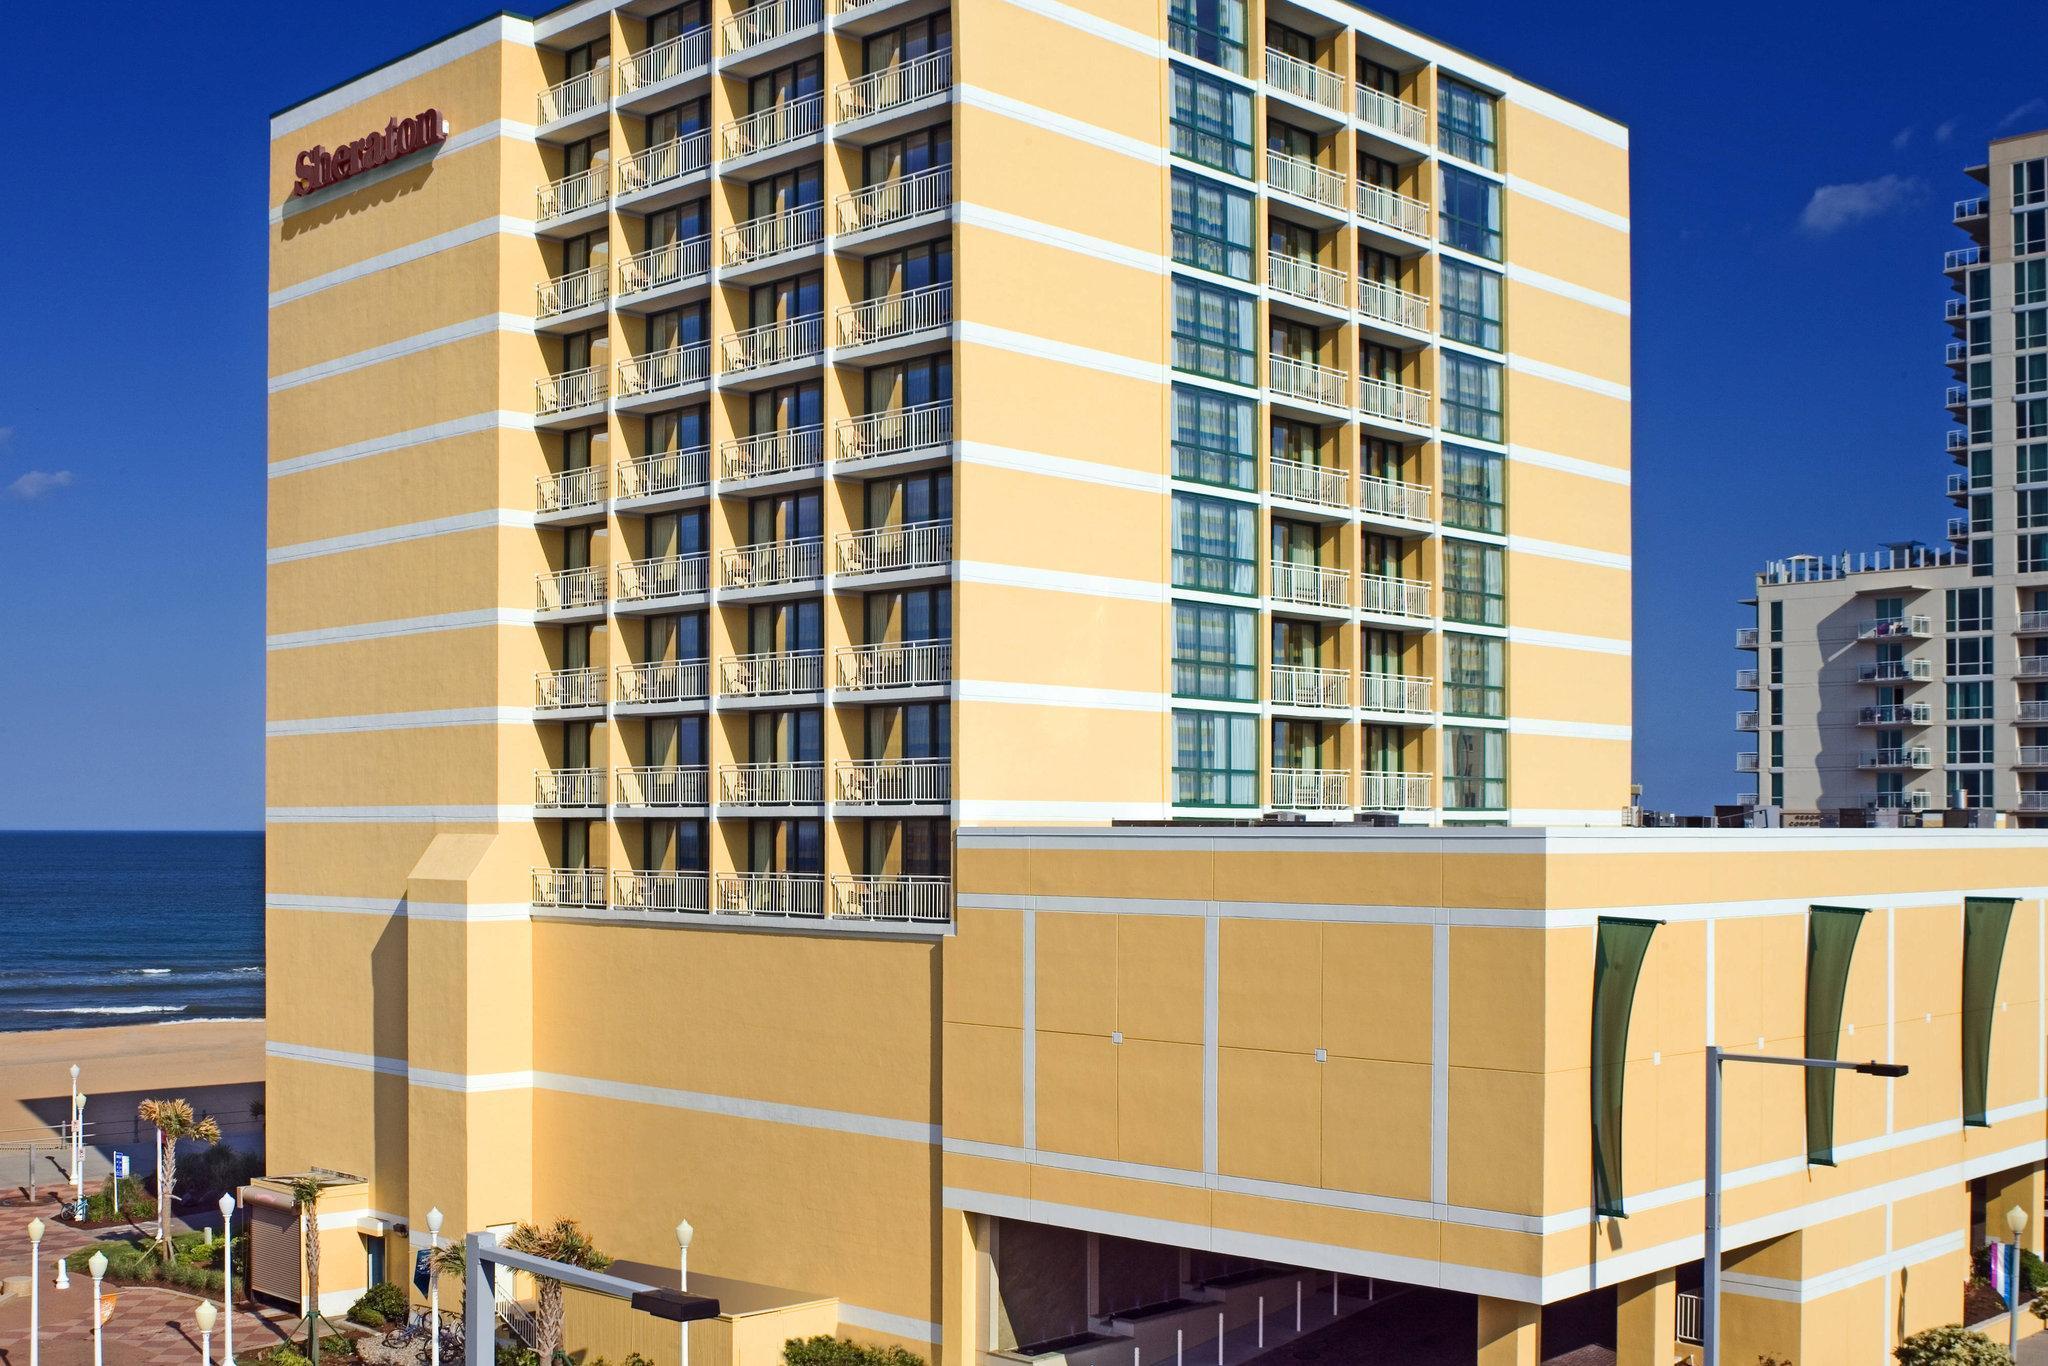 Sheraton Virginia Beach Oceanfront Hotel